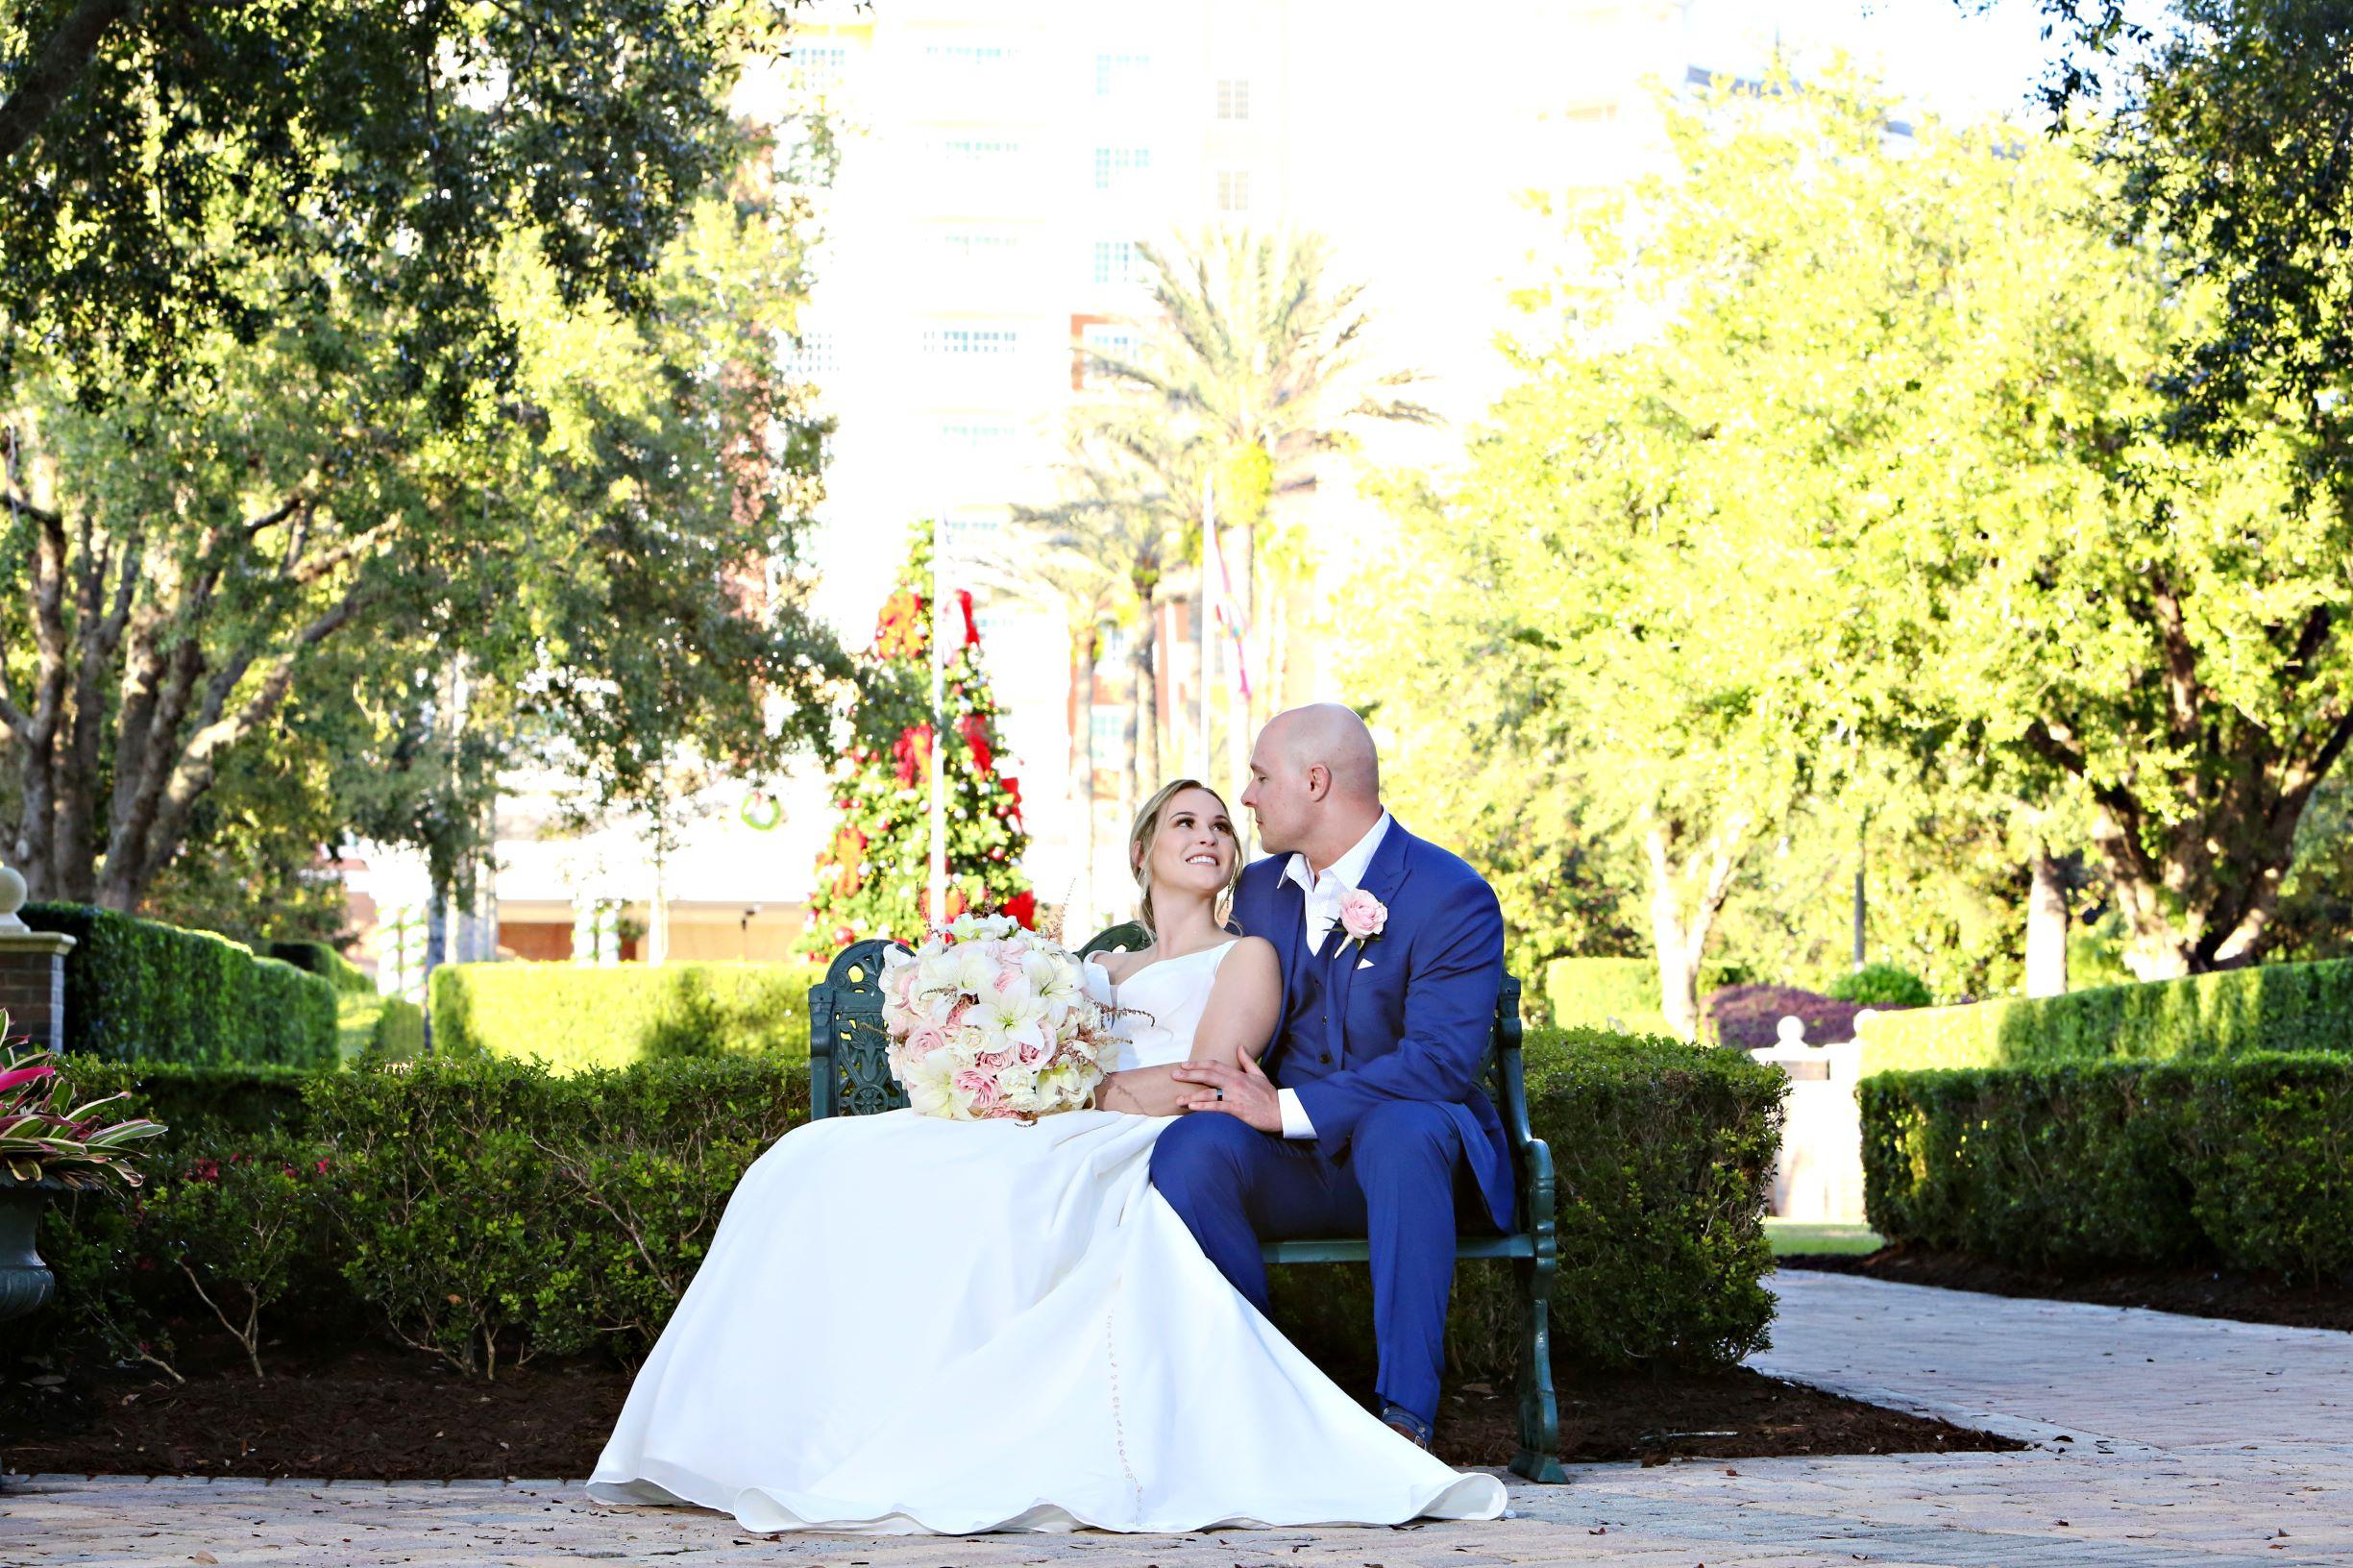 Disney Wedding Venue | Ashley and Aaron at Reunion Resort